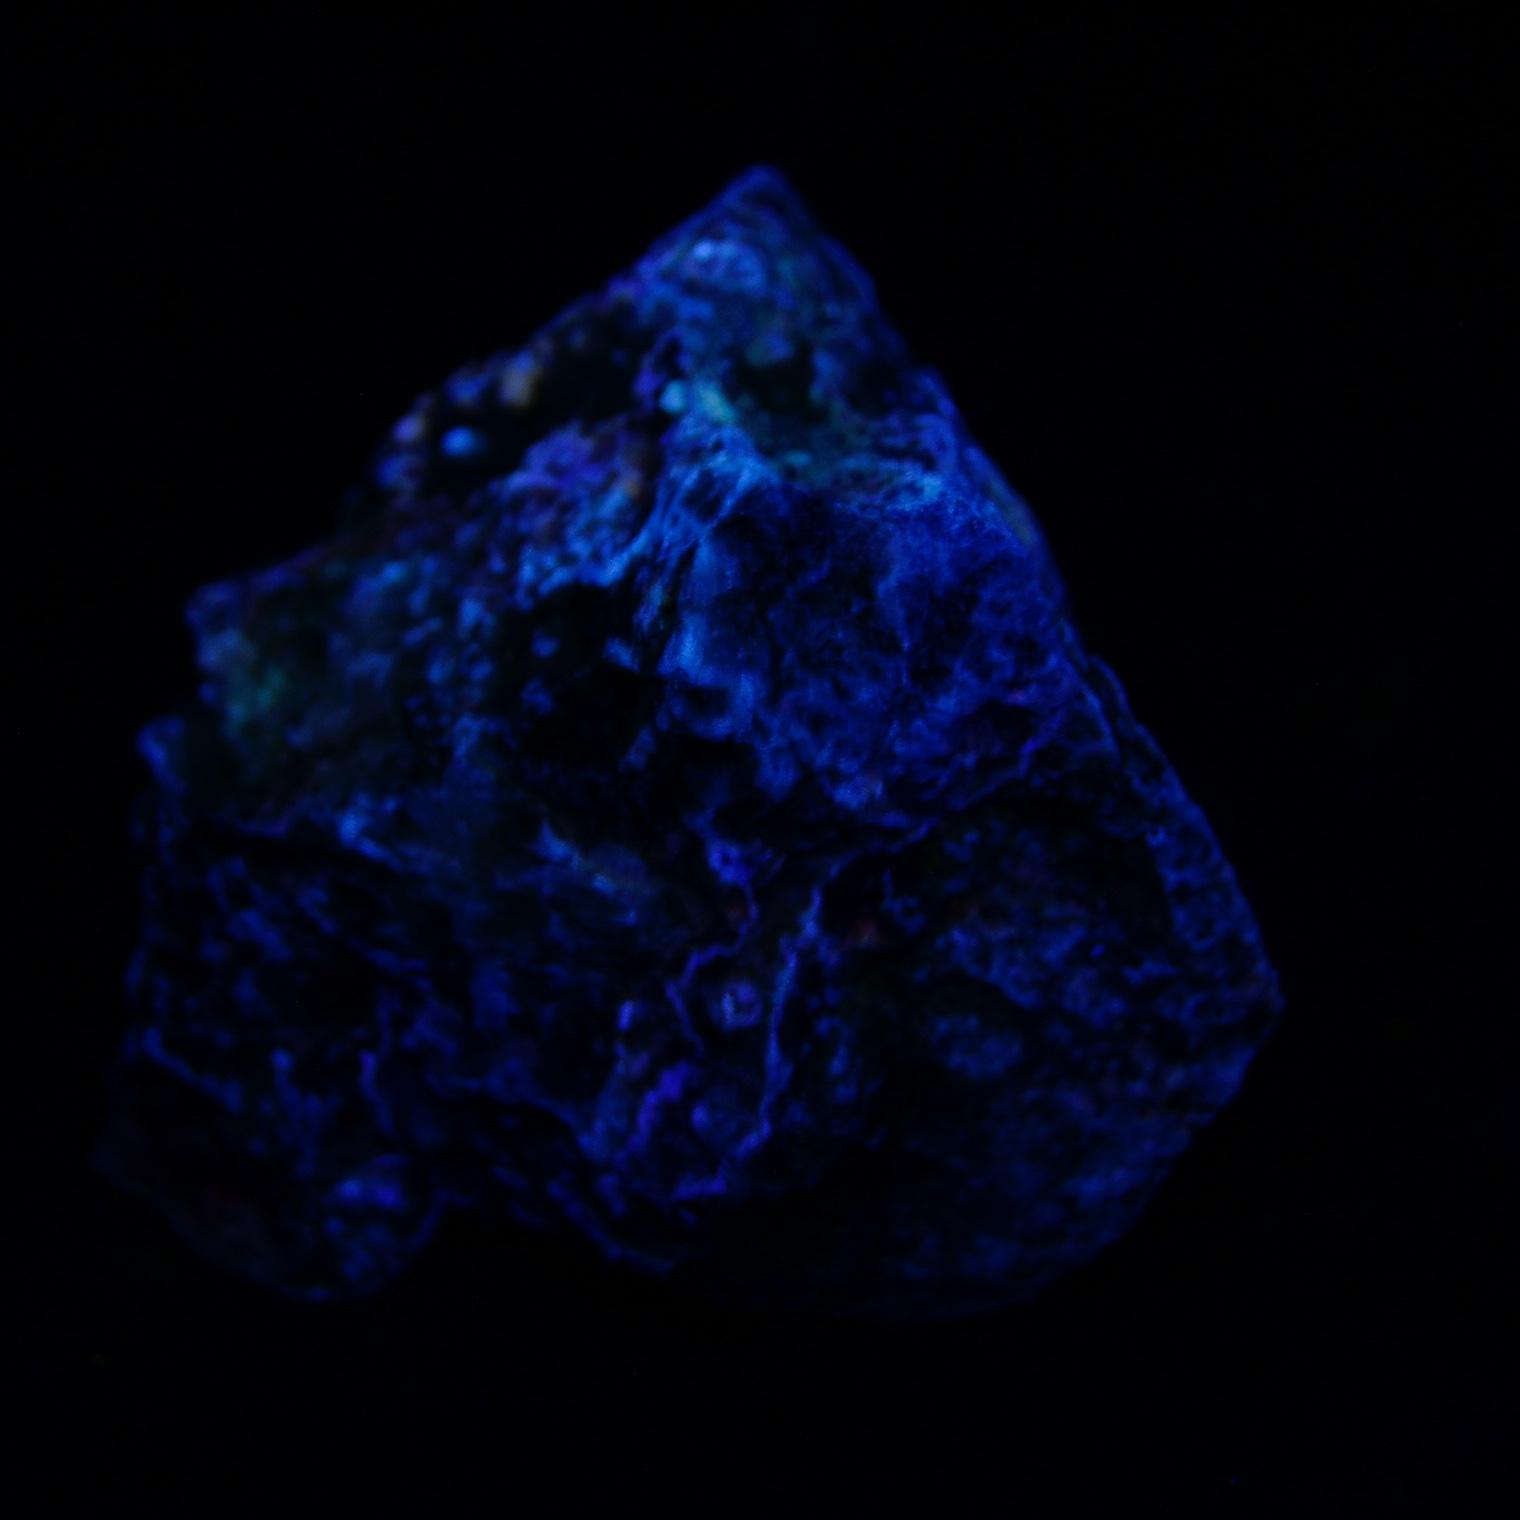 Colección de Minerales Fluorescentes - Página 5 Fullsi52